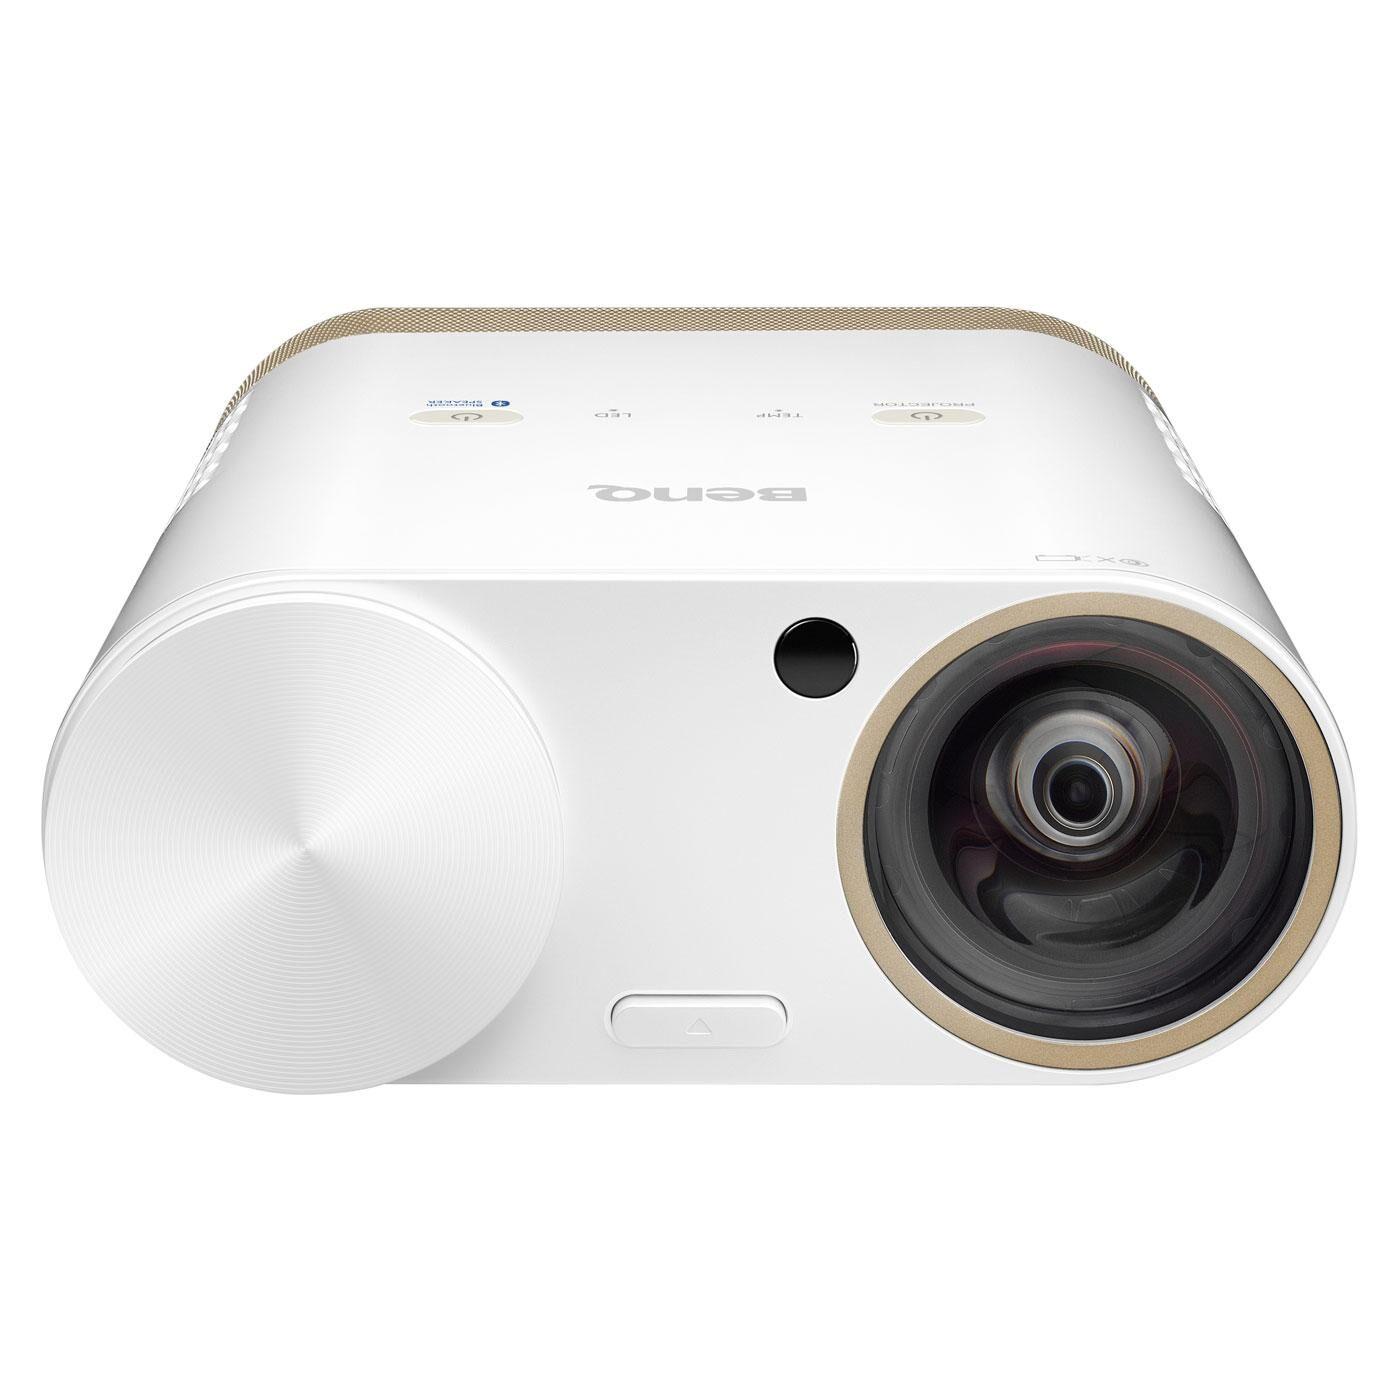 BENQ Vidéoprojecteur i500 multimédia portable DLP WXGA 3D Ready 1280 x 800 Wi-Fi/Bluetooth/HDMI 500 Lumens - Focale courte